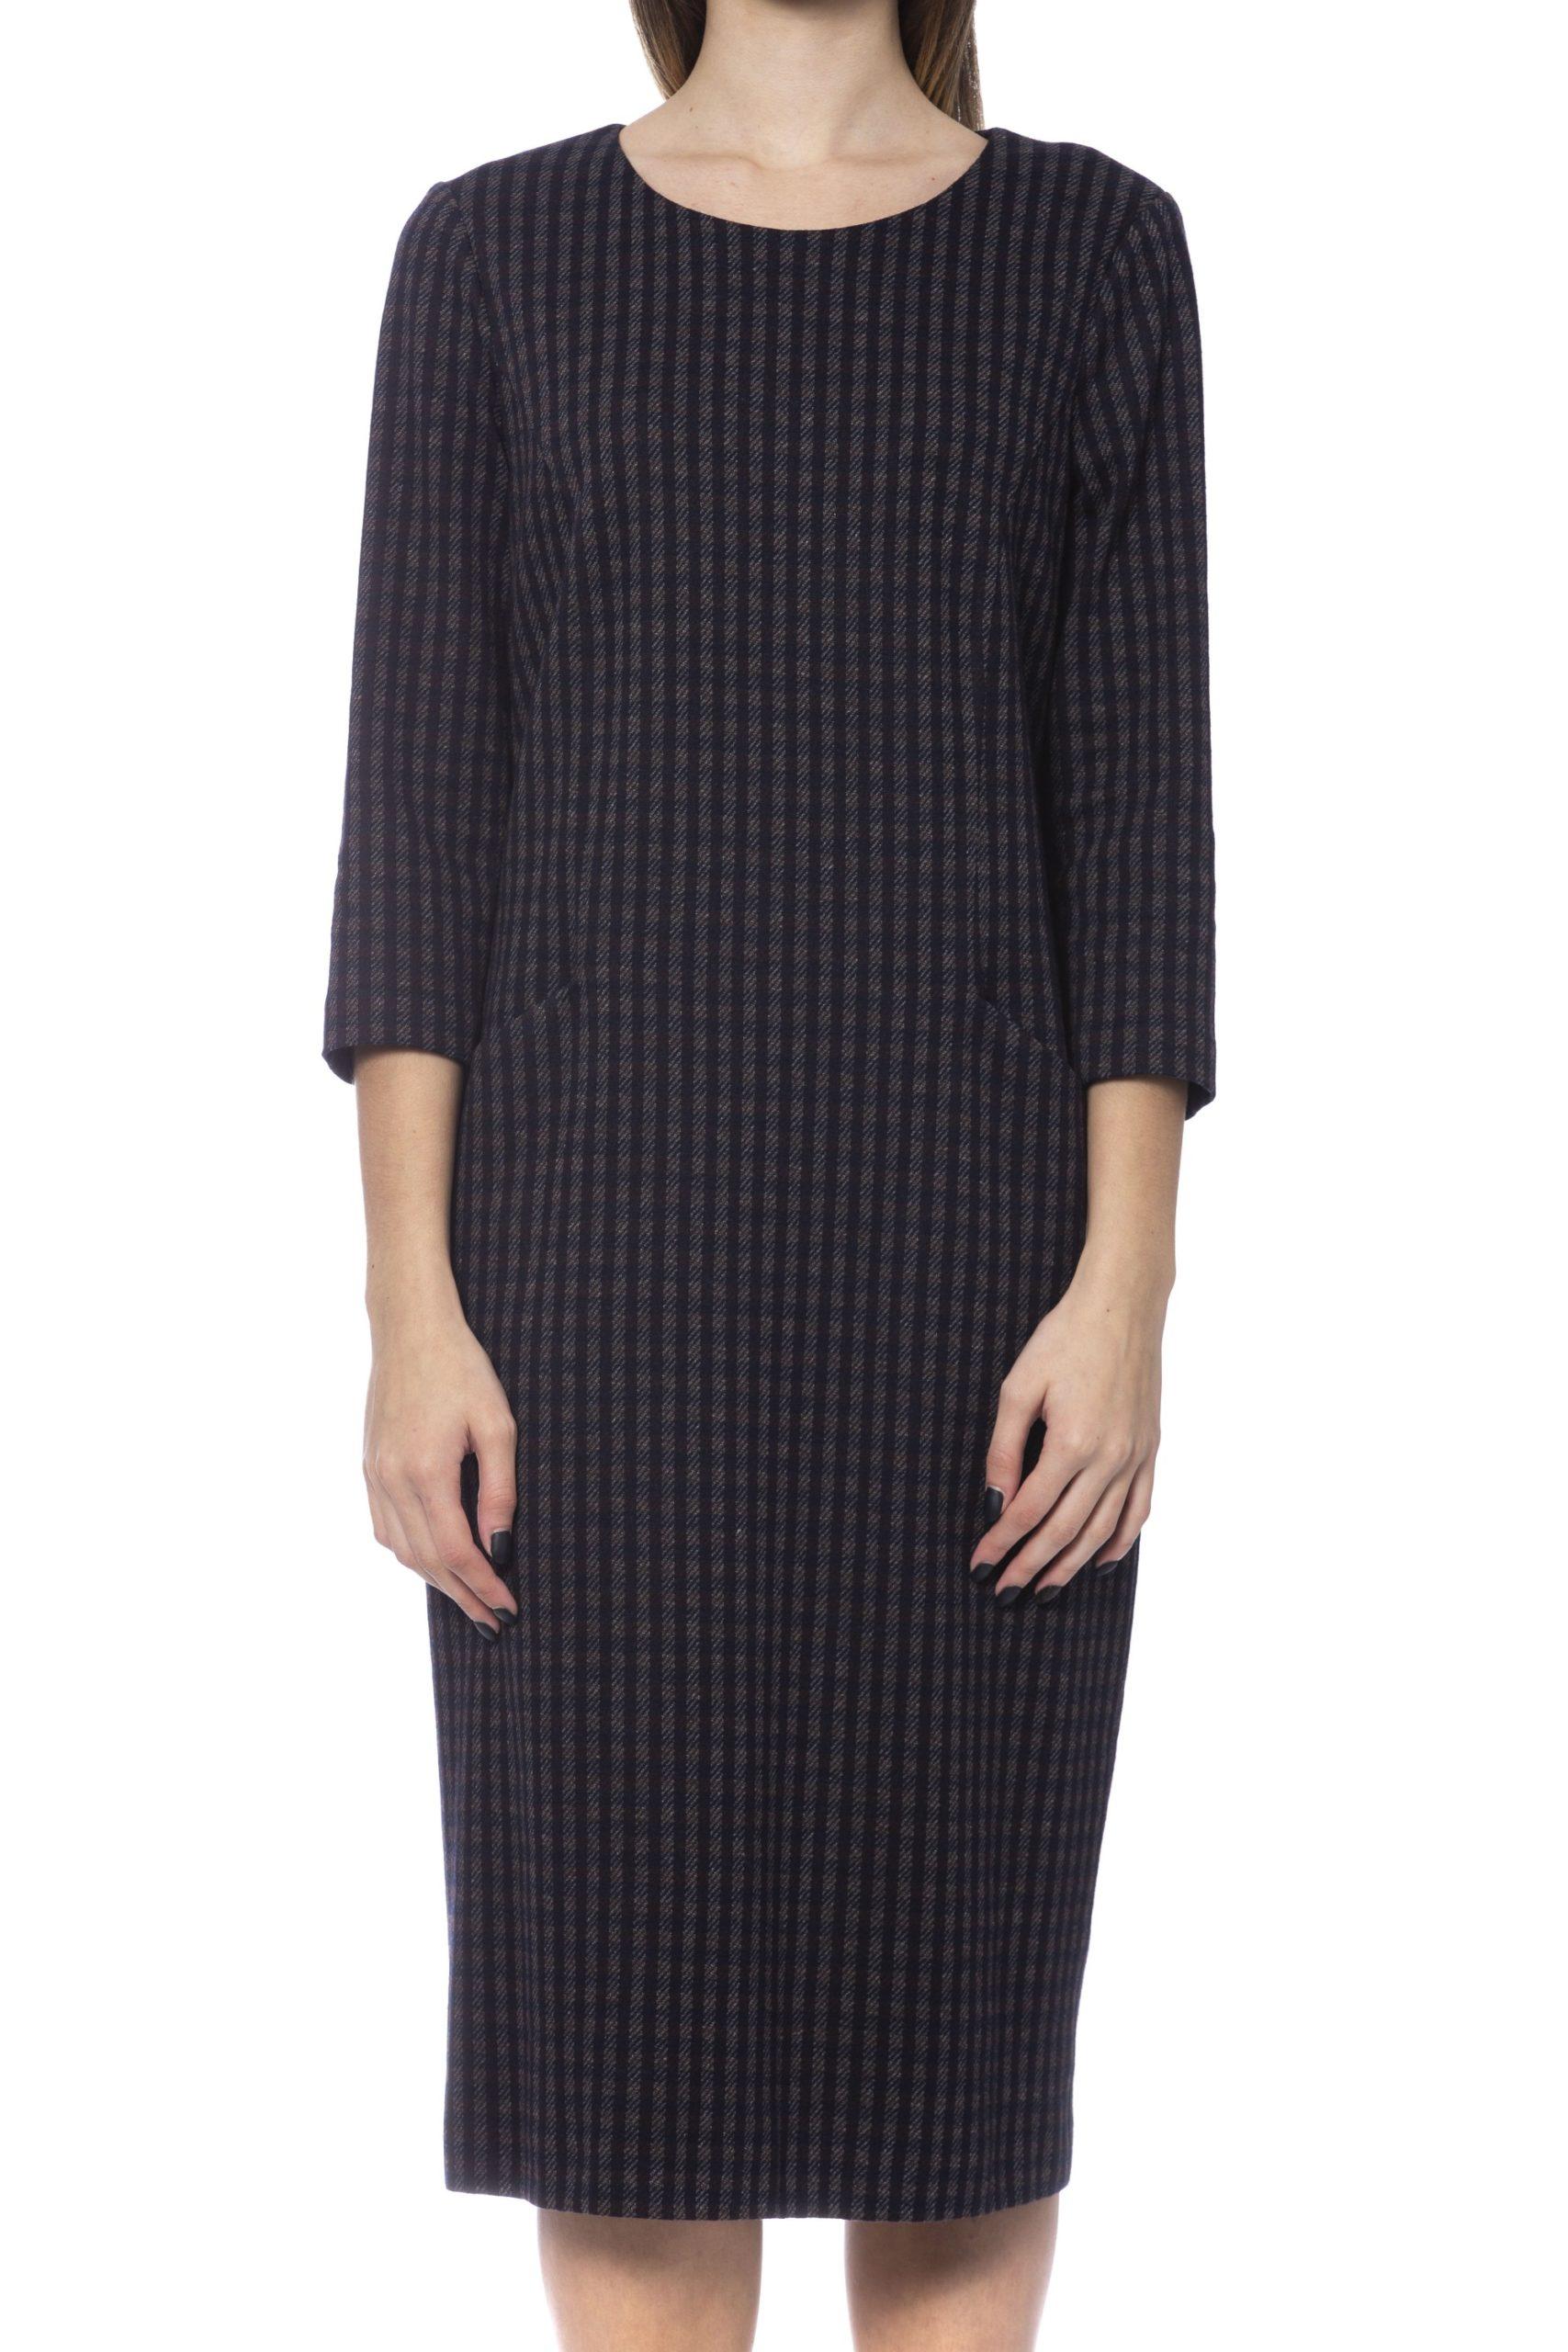 Peserico Women's Dress Blue PE993642 - IT42 | S